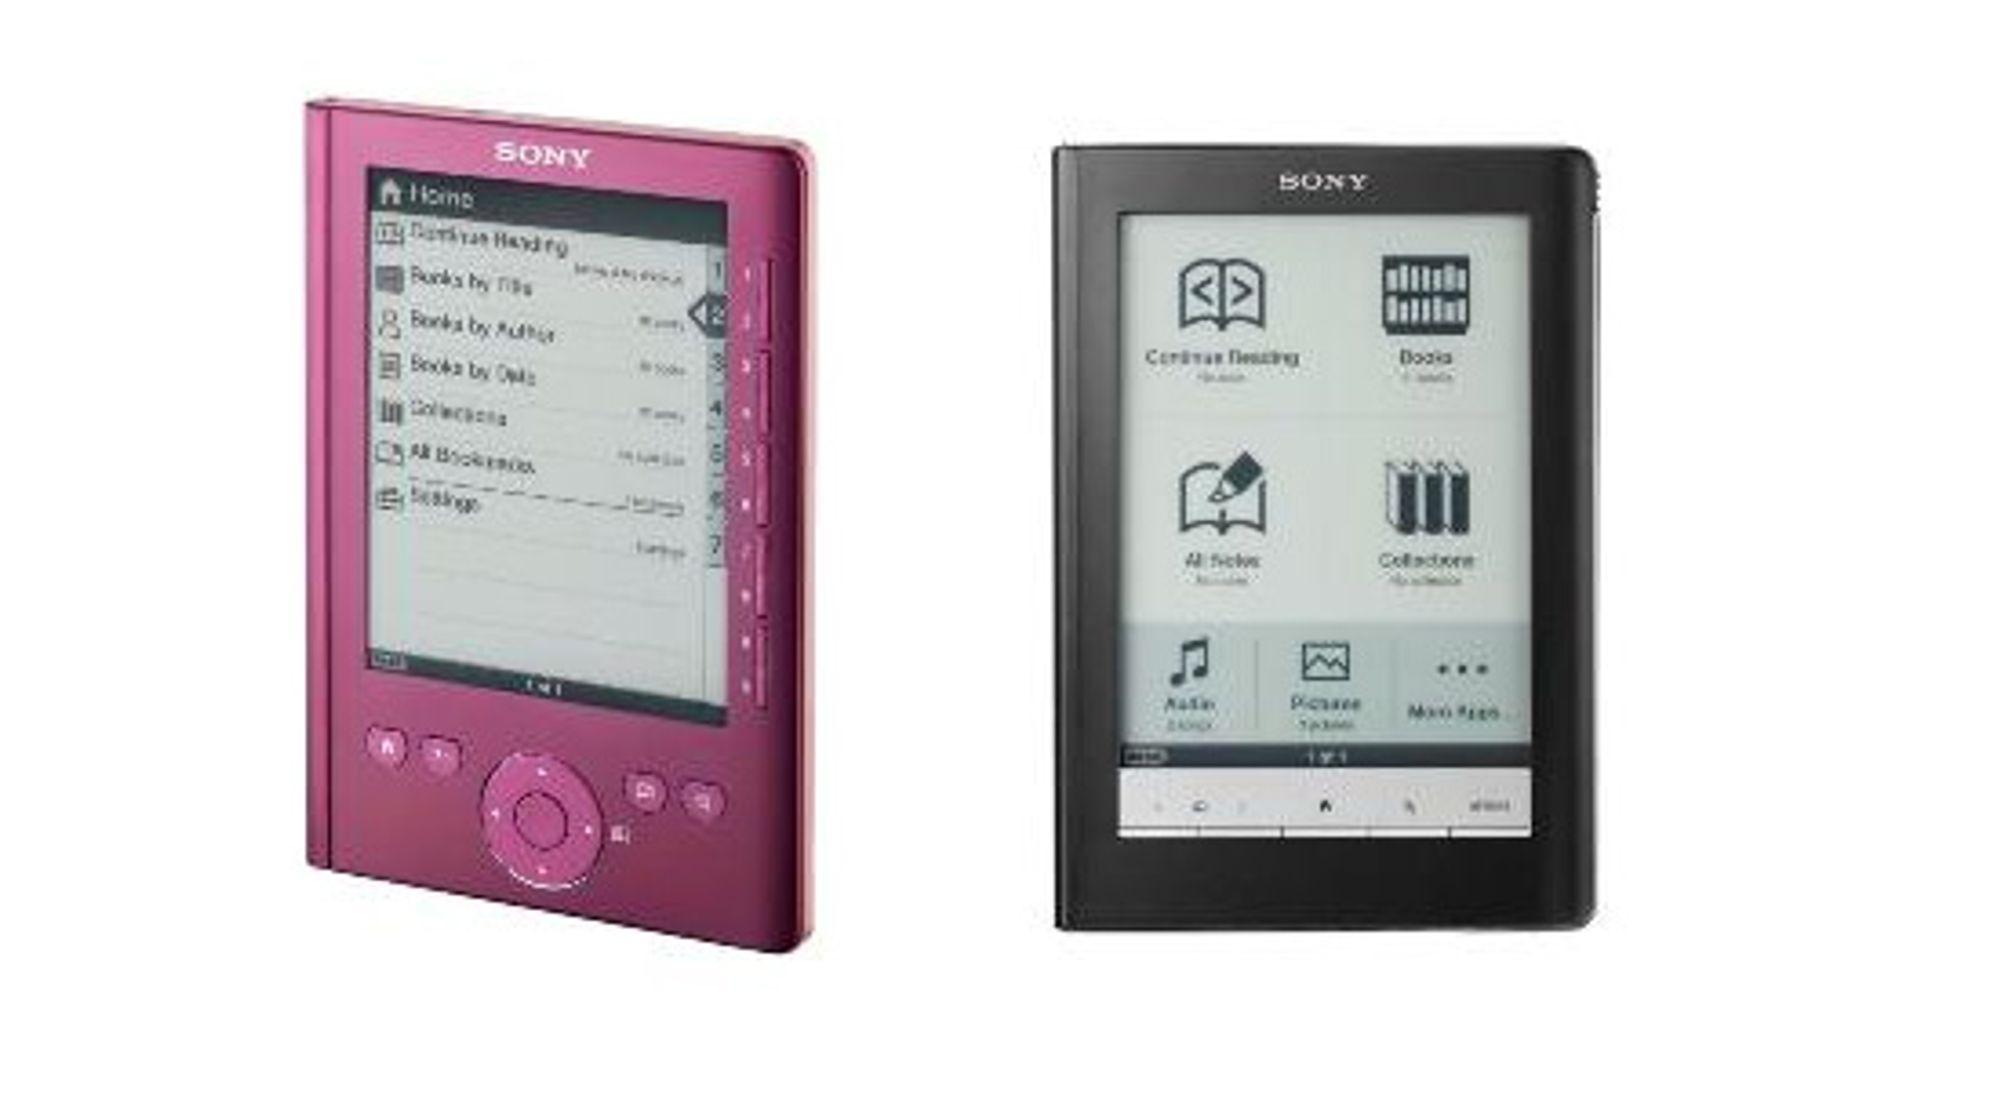 Sonys PRS-300 til venstre og PRS-600 til høyre. (Foto: Sony)